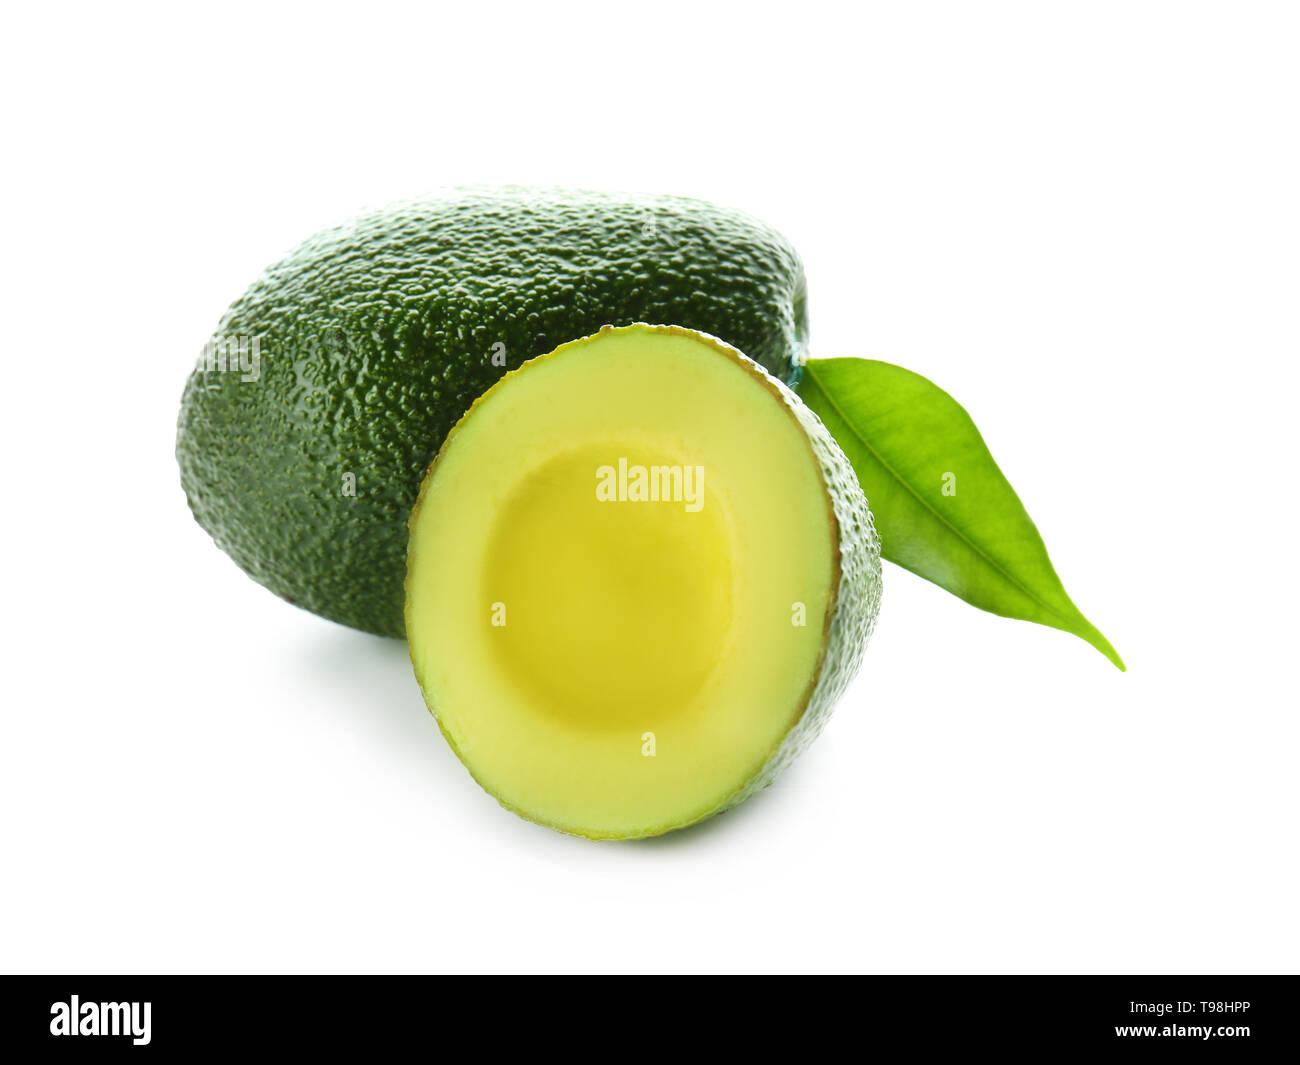 Ripe avocados on white background - Stock Image